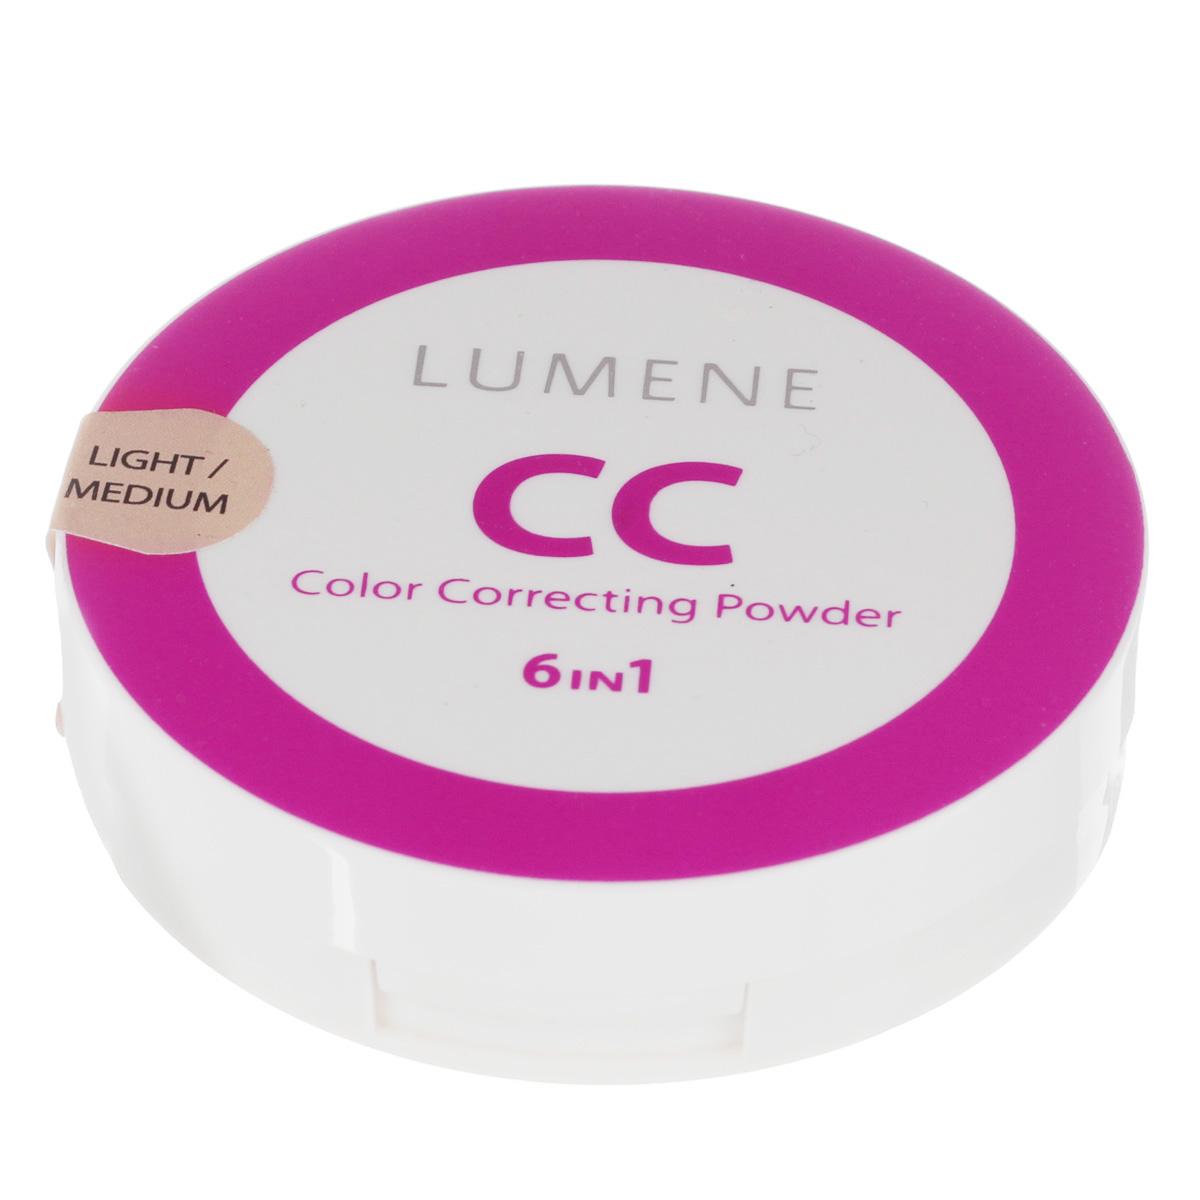 Lumene ����� Lumene CC: ���������� ������������, ��� �������, �������, 10 � - LUMENENL32-83813����� �������� ����������� ����, ����� ����� ���� ���������! �� ���������� �� �� LUMENE ��� ��������, ��� ��� ��� �� ������ ��������� �������������� � ����������� ���, � ������������� �������������� ����. �������������������� �������� ������������ � ���� ����, ������������ ���� ����, ������� ������ � ������������ ���������. ��-�������� ����� ������� �� ���������, ��� ��. � ������� ������� �� �� LUMENE ���������� ����������� ��������, ������� ��������� ����. ����� ��������������.